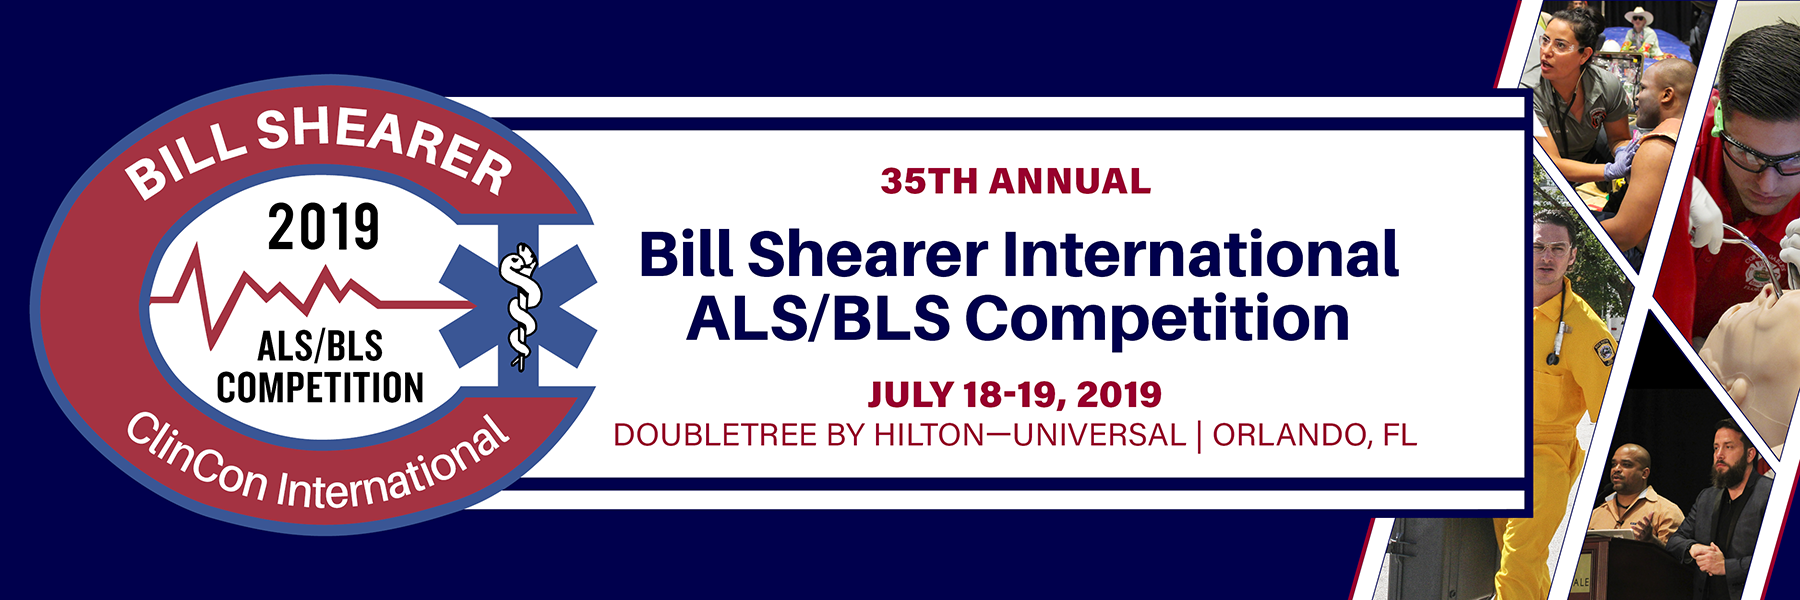 2019 ALS/BLS Competition